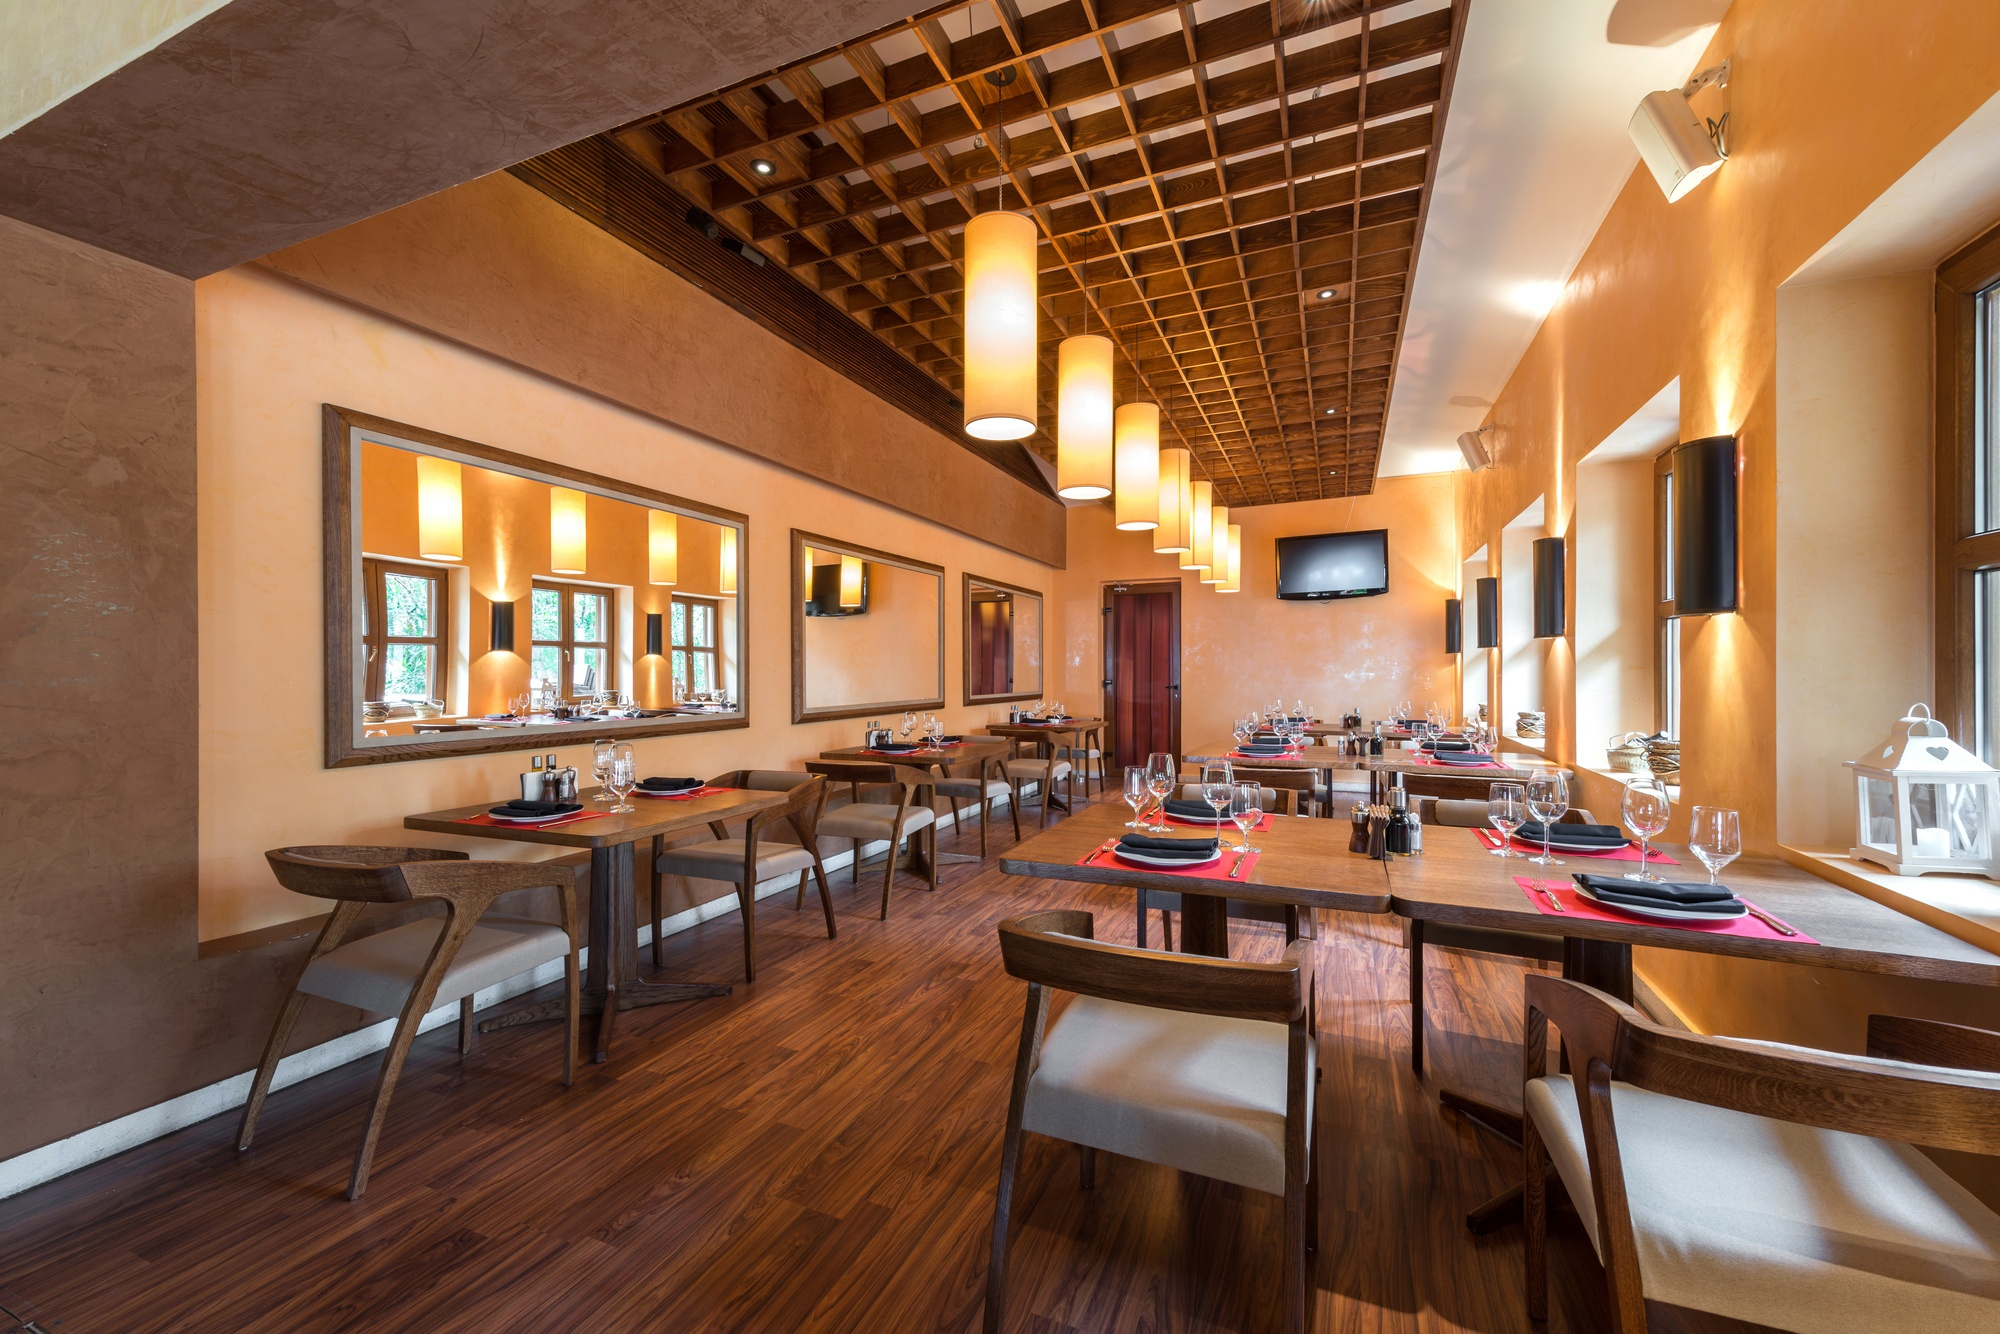 Restaurant Layout-Restaurant Lighting